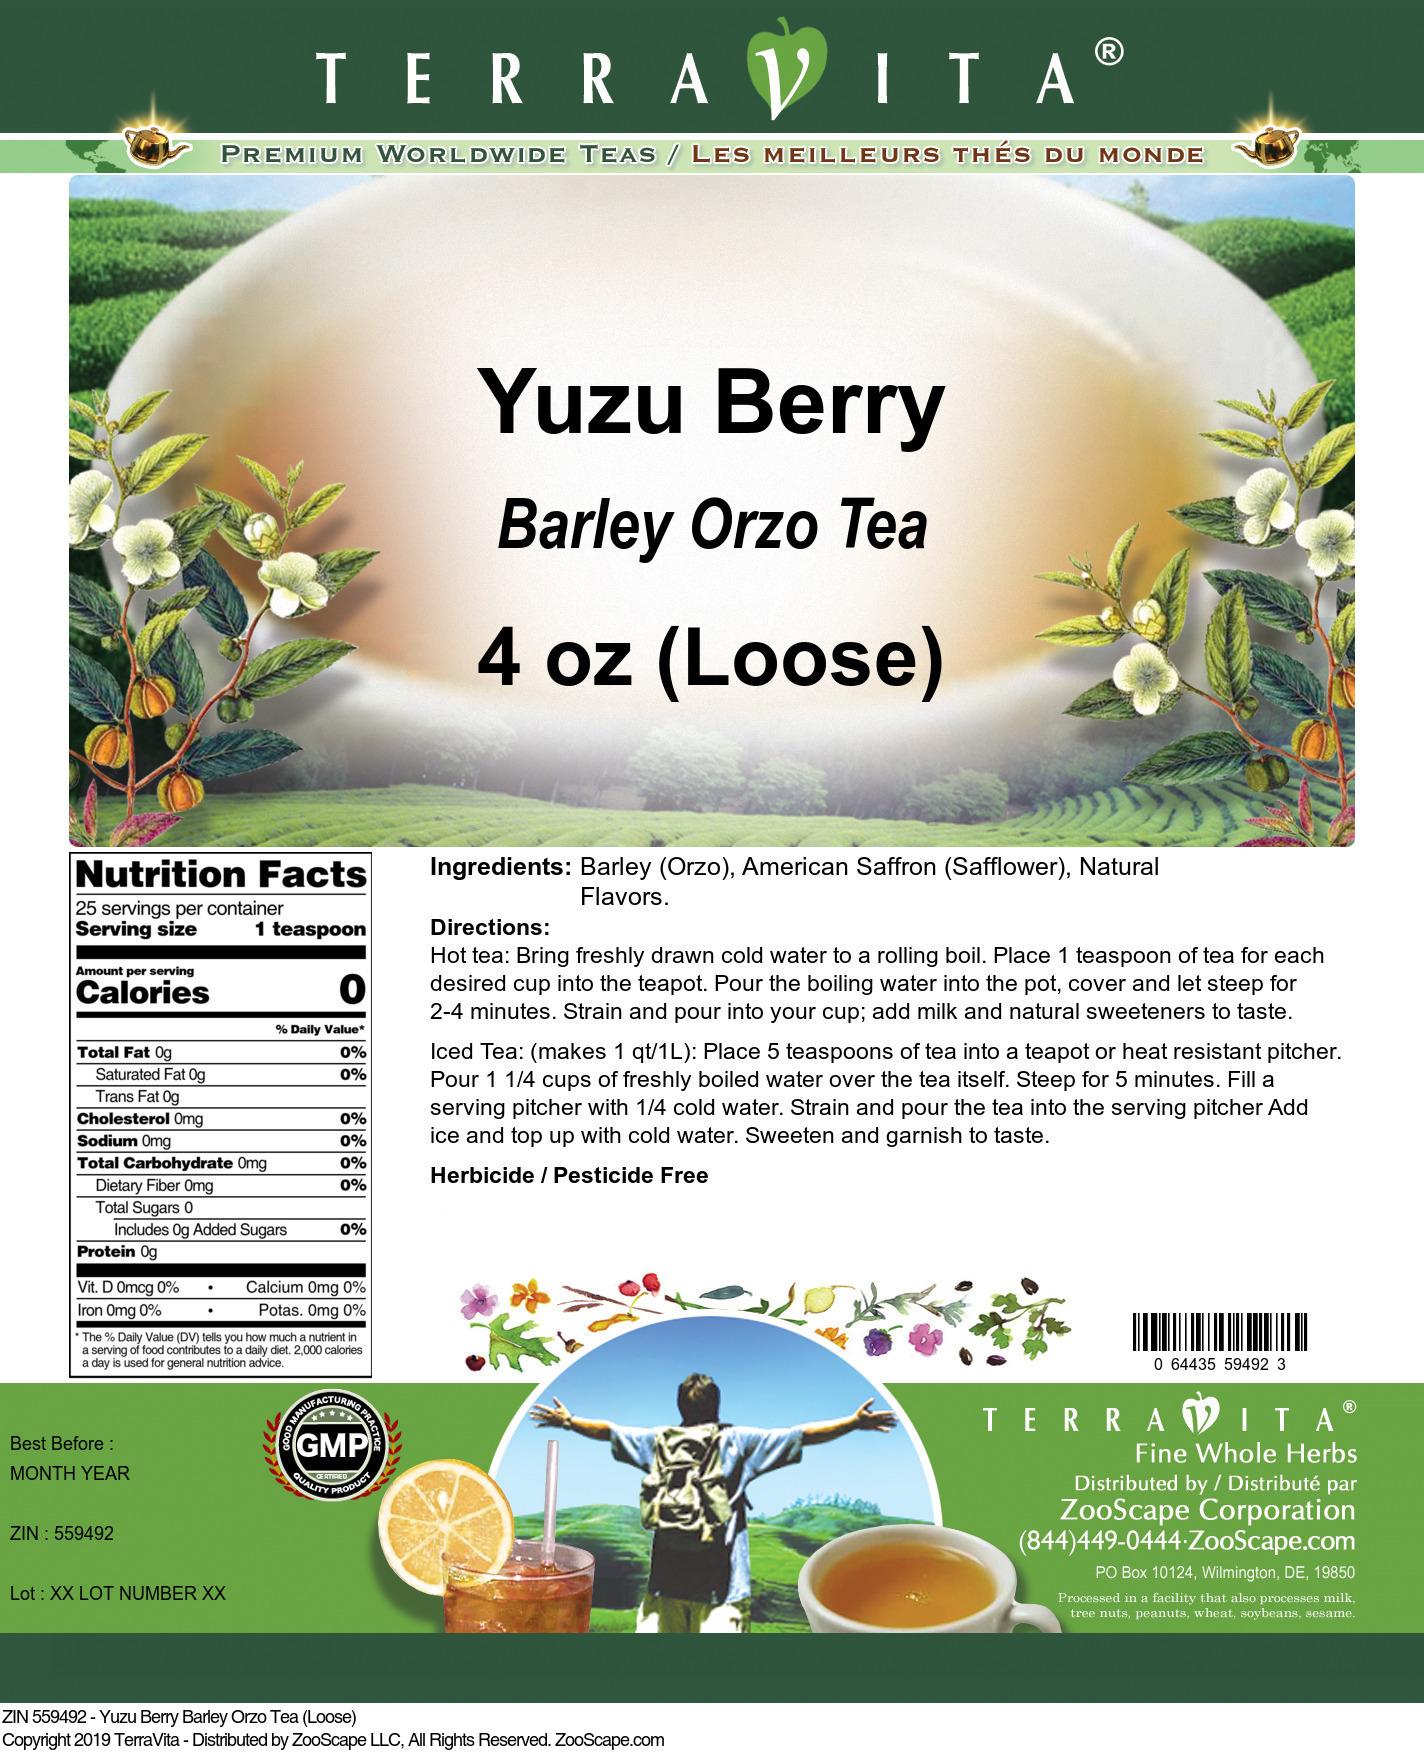 Yuzu Berry Barley Orzo